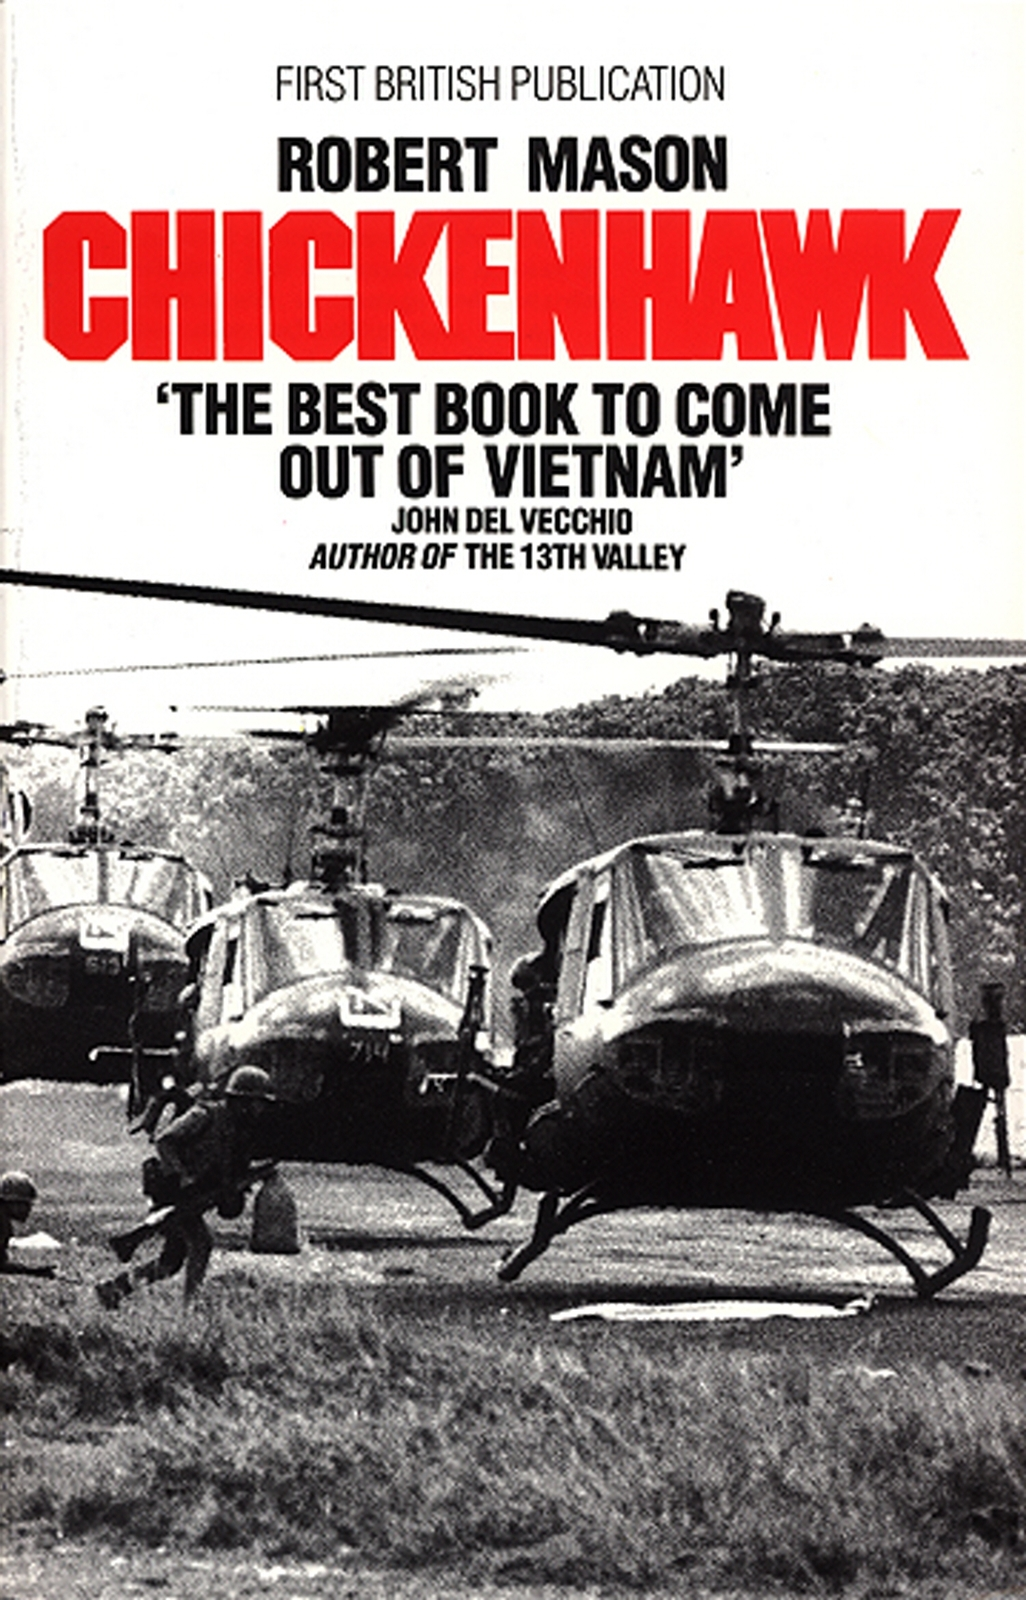 Chickenhawk by Robert Mason image